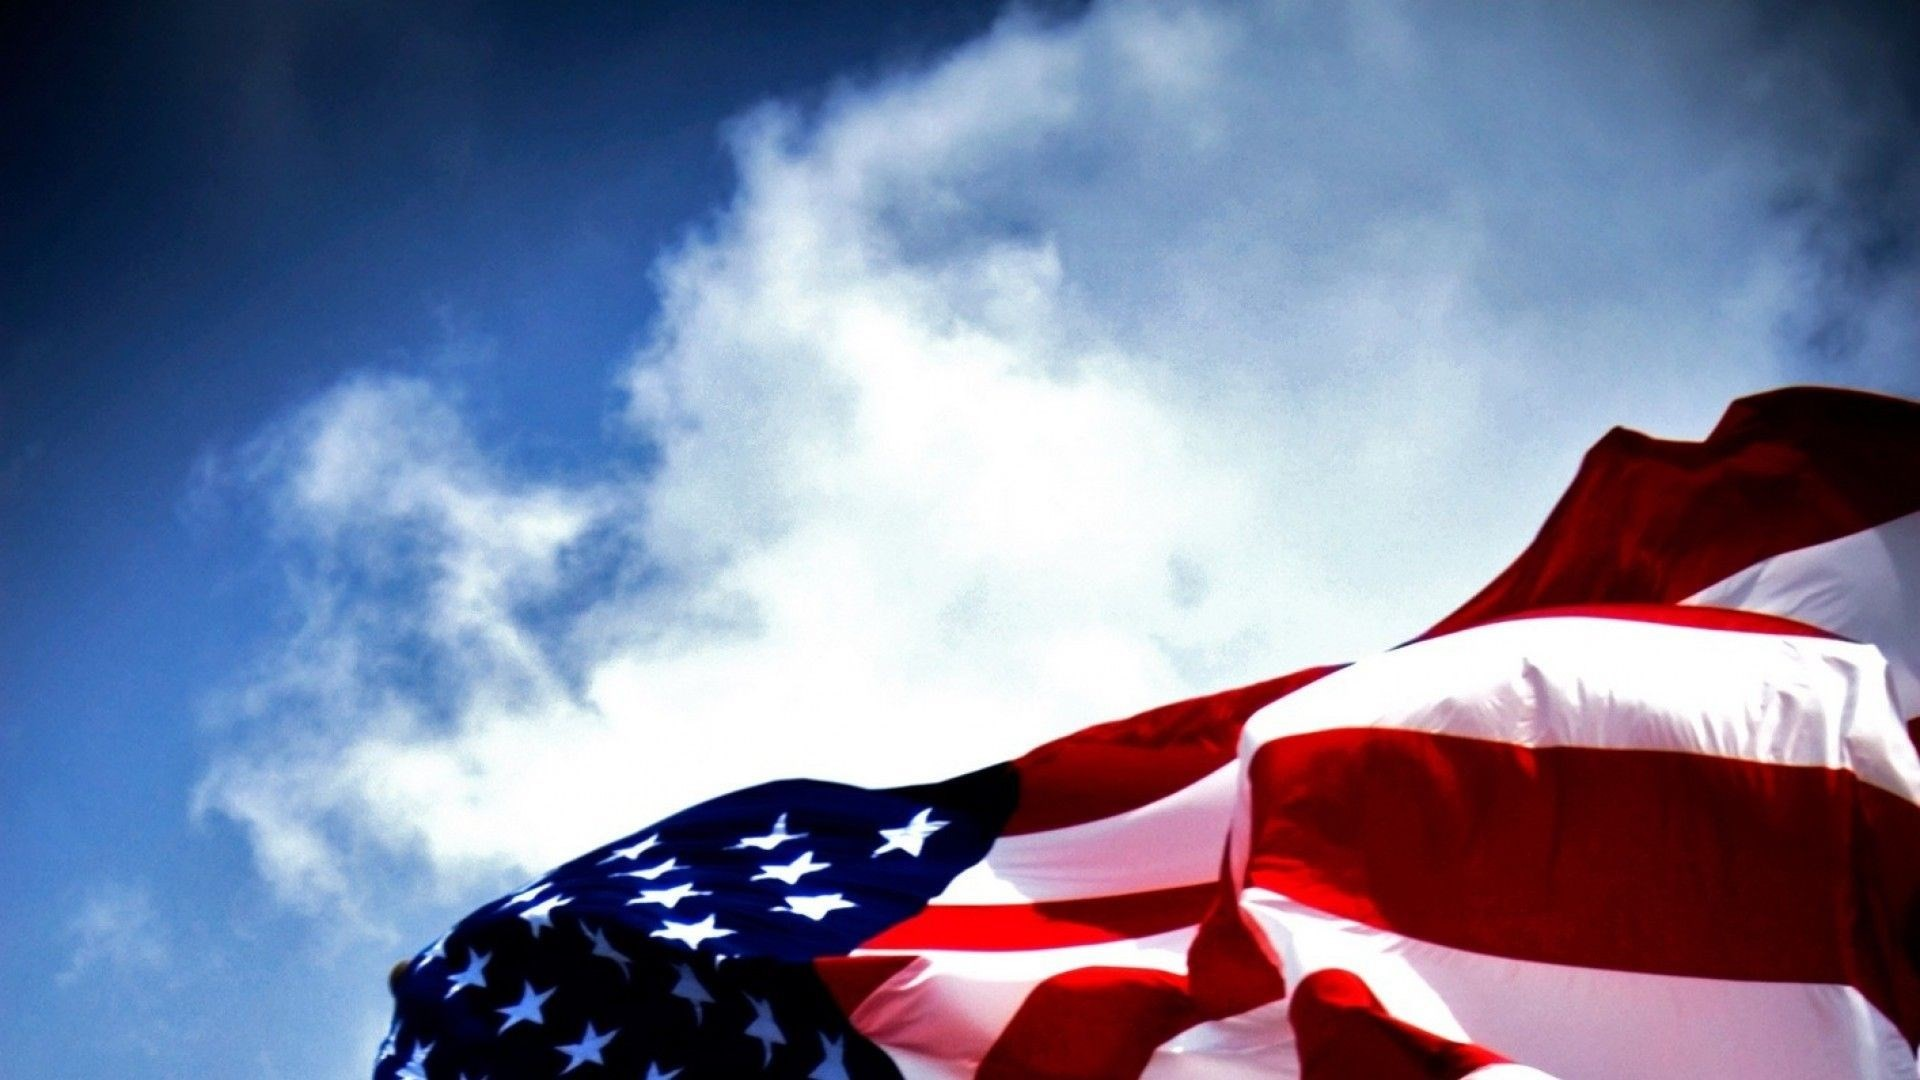 american flag wallpaper pack 1080p hd